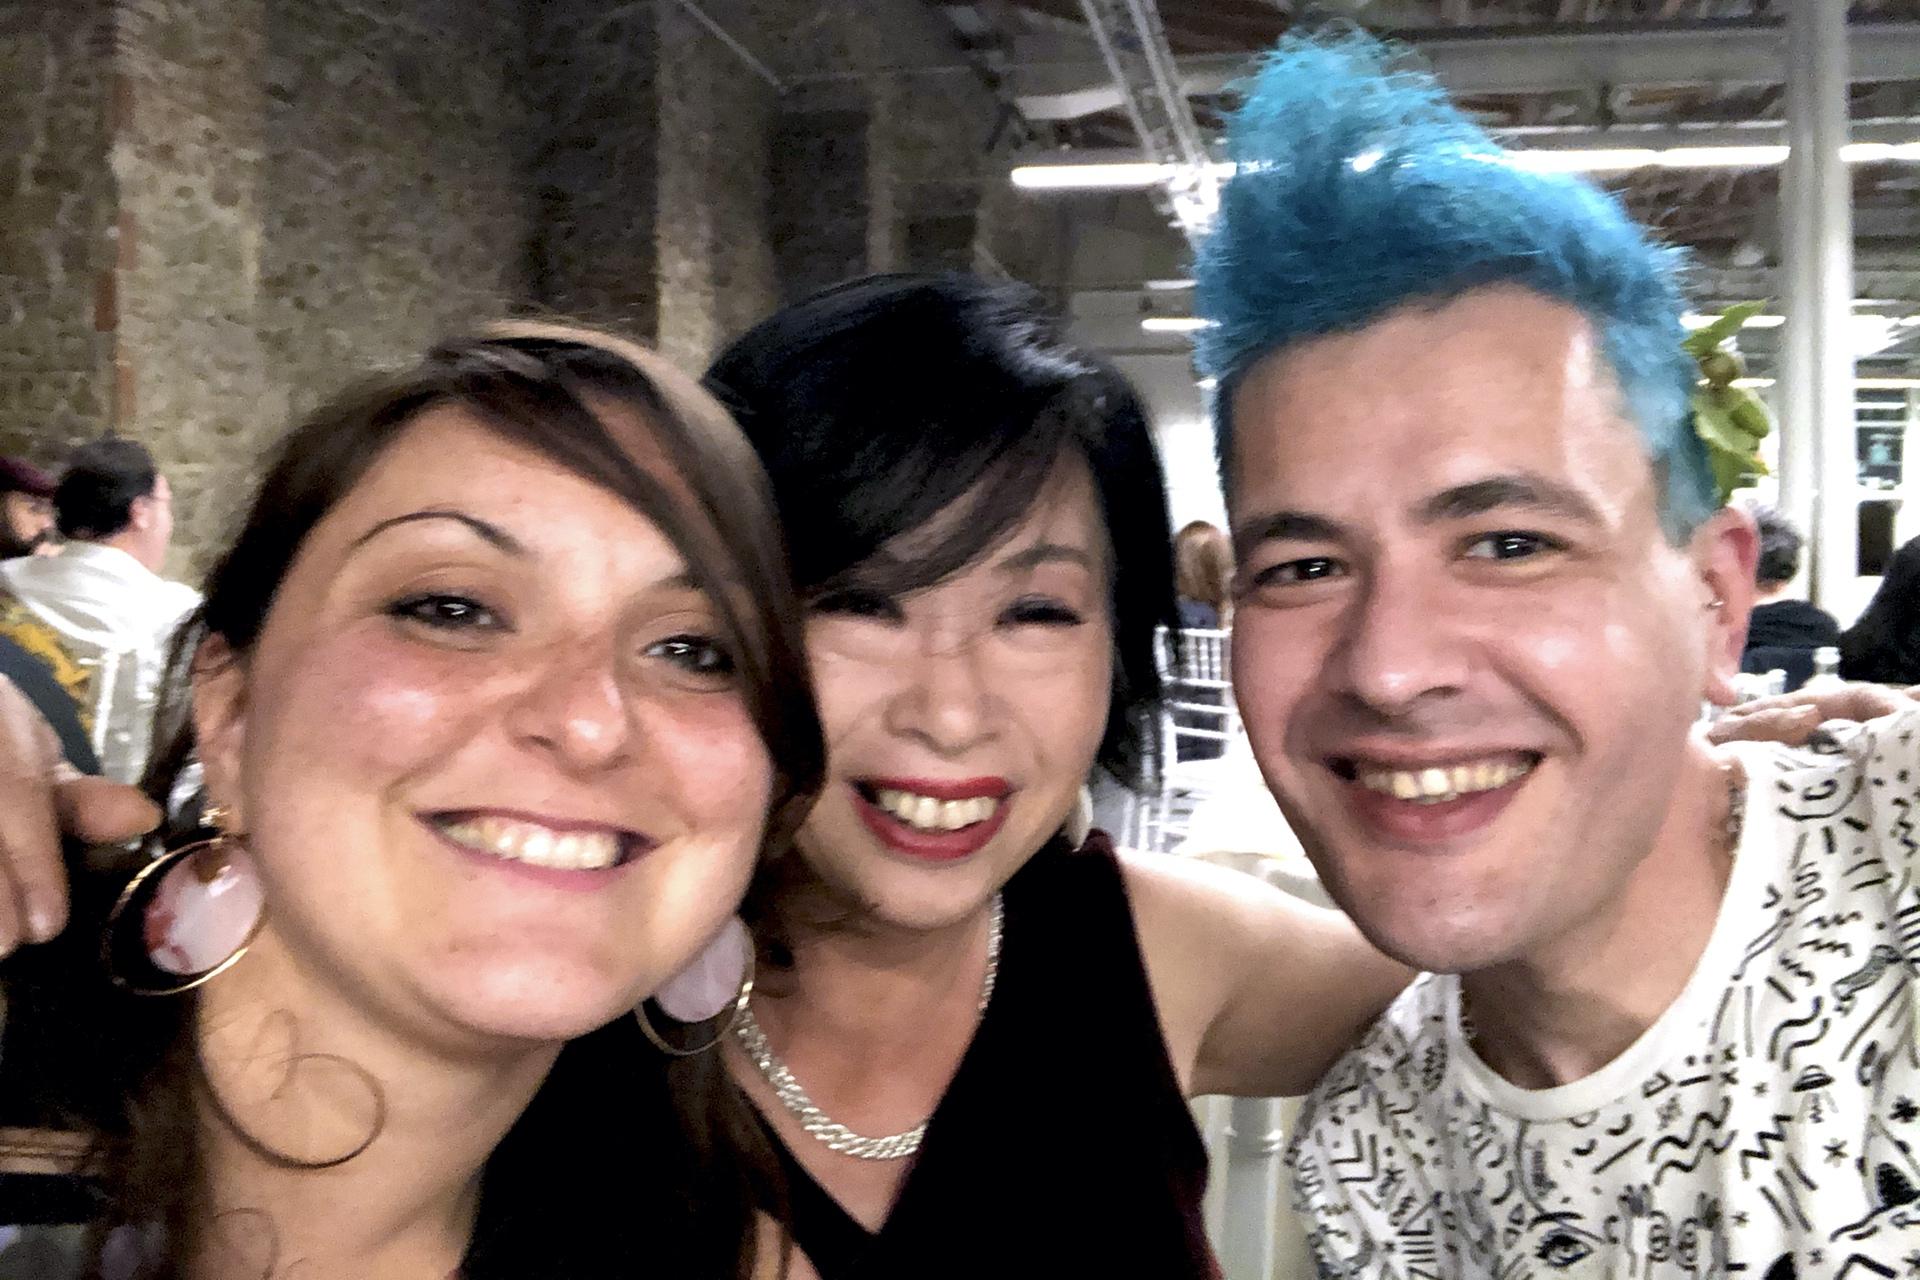 Perni, Liku Maria Takahashi & Pako Campo at Fluorescence Biennale